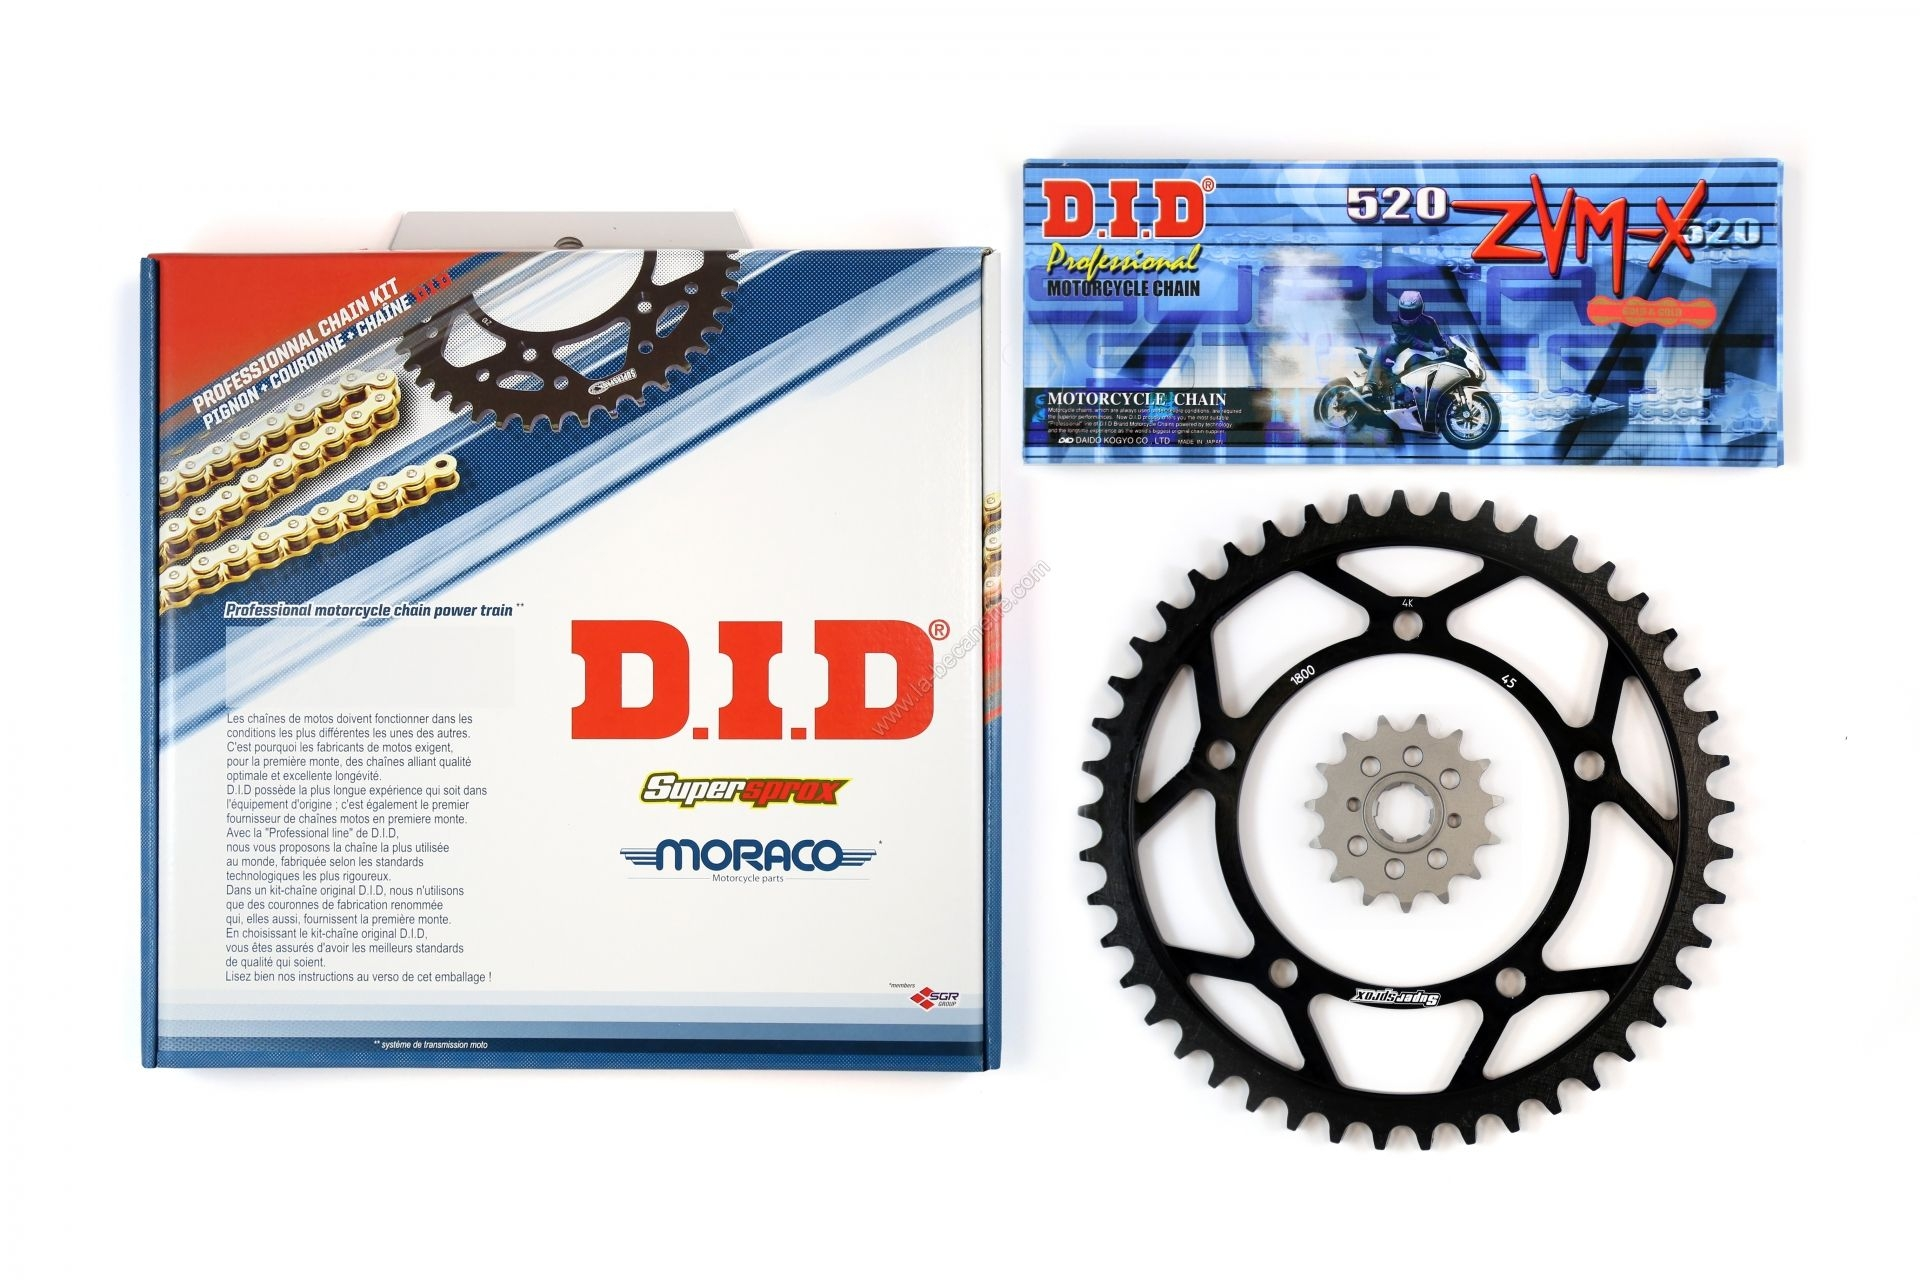 Kit chaîne DID 420 type D 11/47 couronne acier Rieju 50 RS3 Matrix 11-